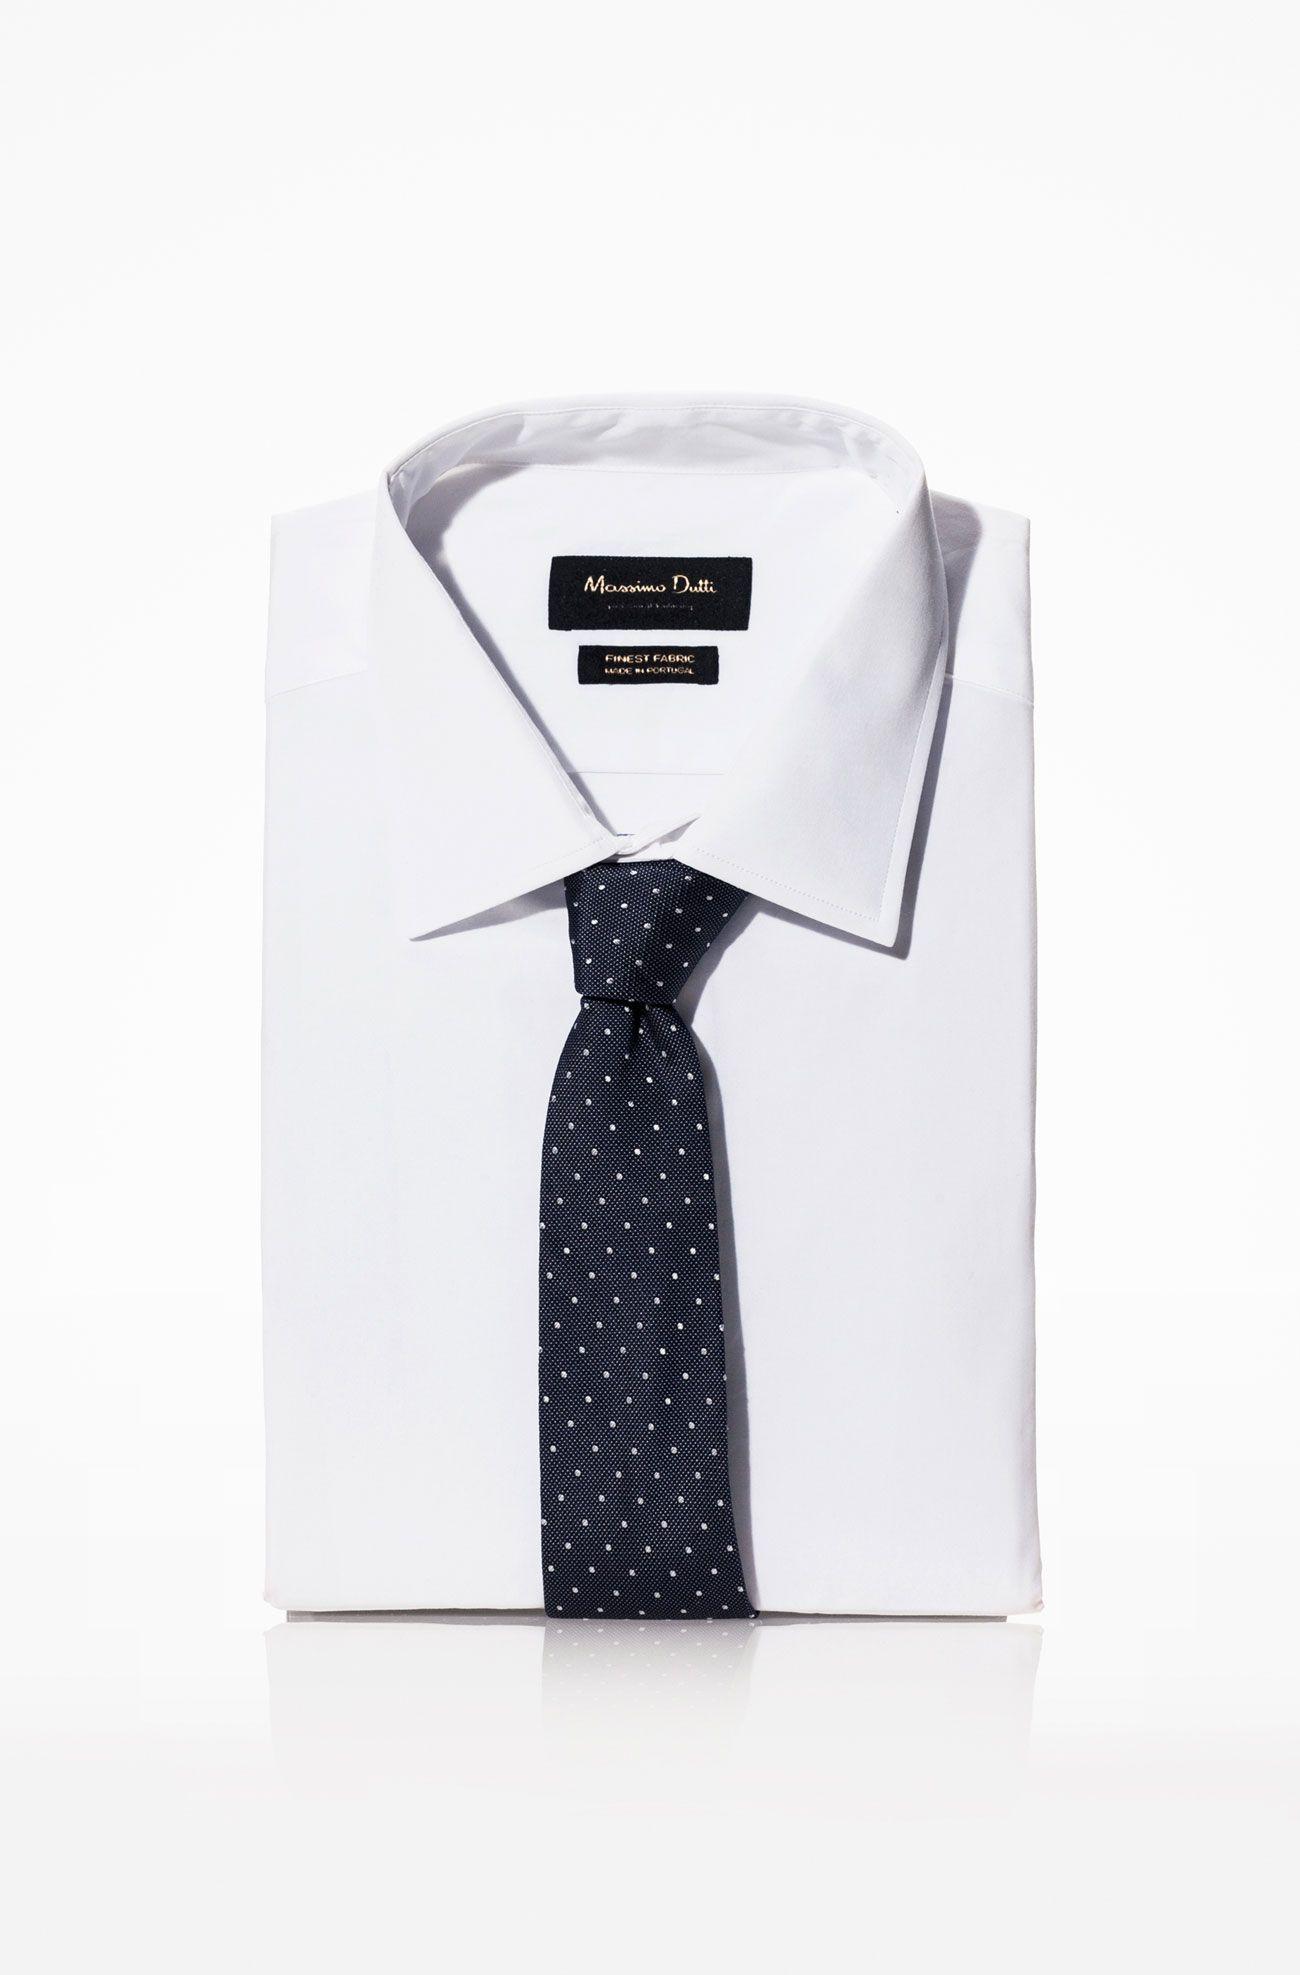 Massimo dulti navy polka dot tie 4495 1207299 wedding suit massimo dulti navy polka dot tie 4495 1207299 ccuart Image collections